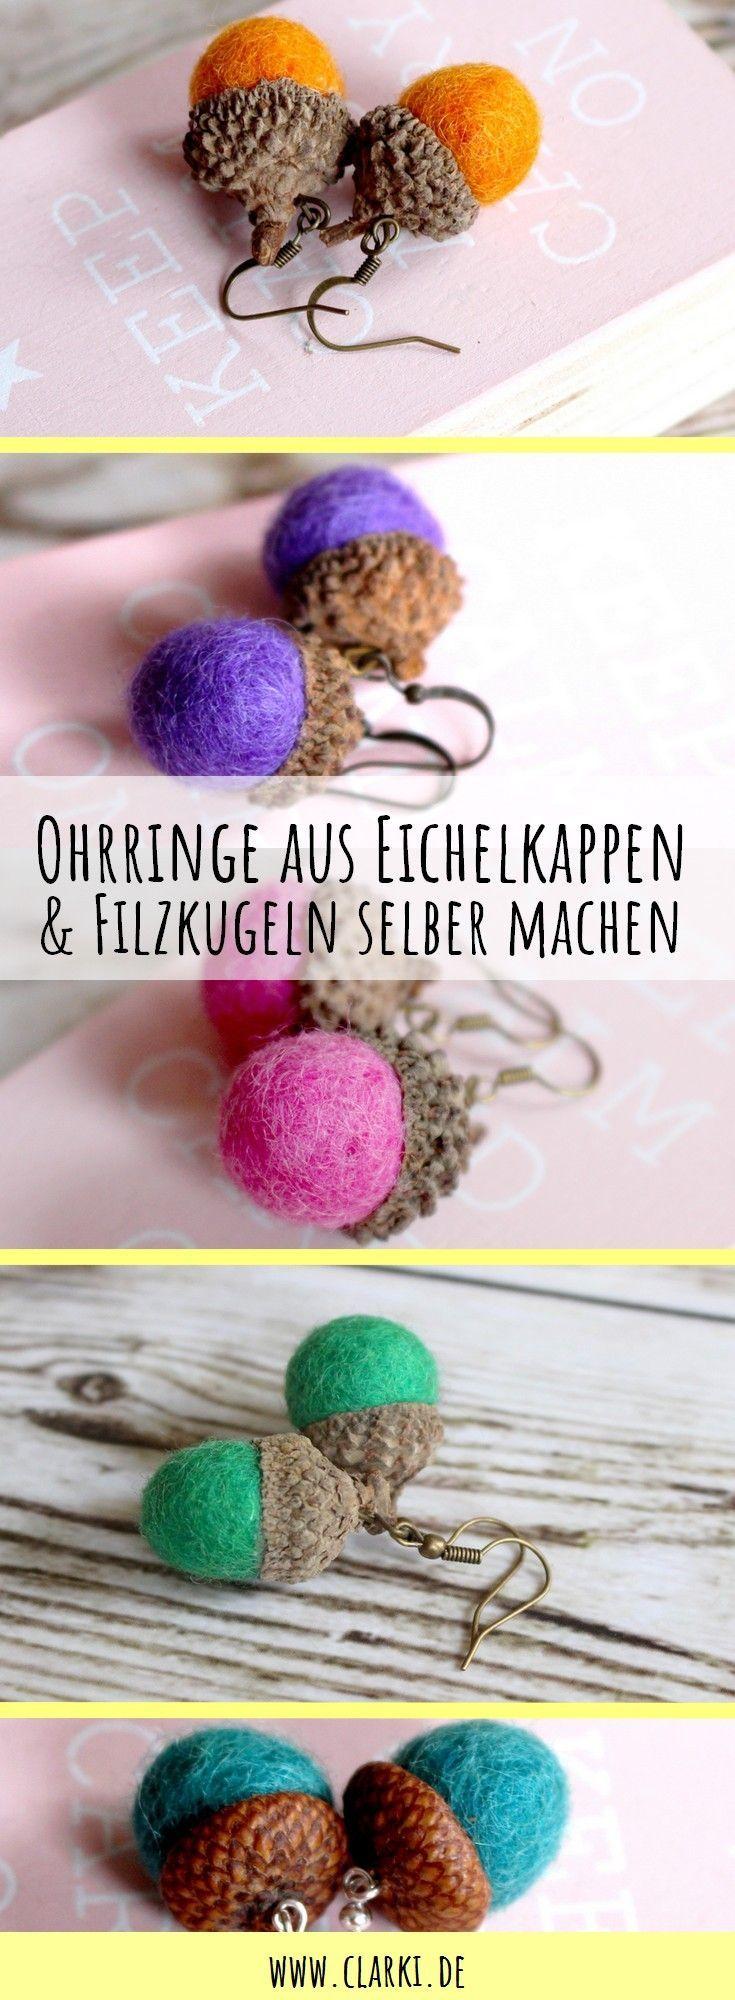 Schmuck DIY: Ohrringe aus Eichelkappen und Filzkugeln – clarki.de – DIY, Food, kreative Bücher & (e)Books